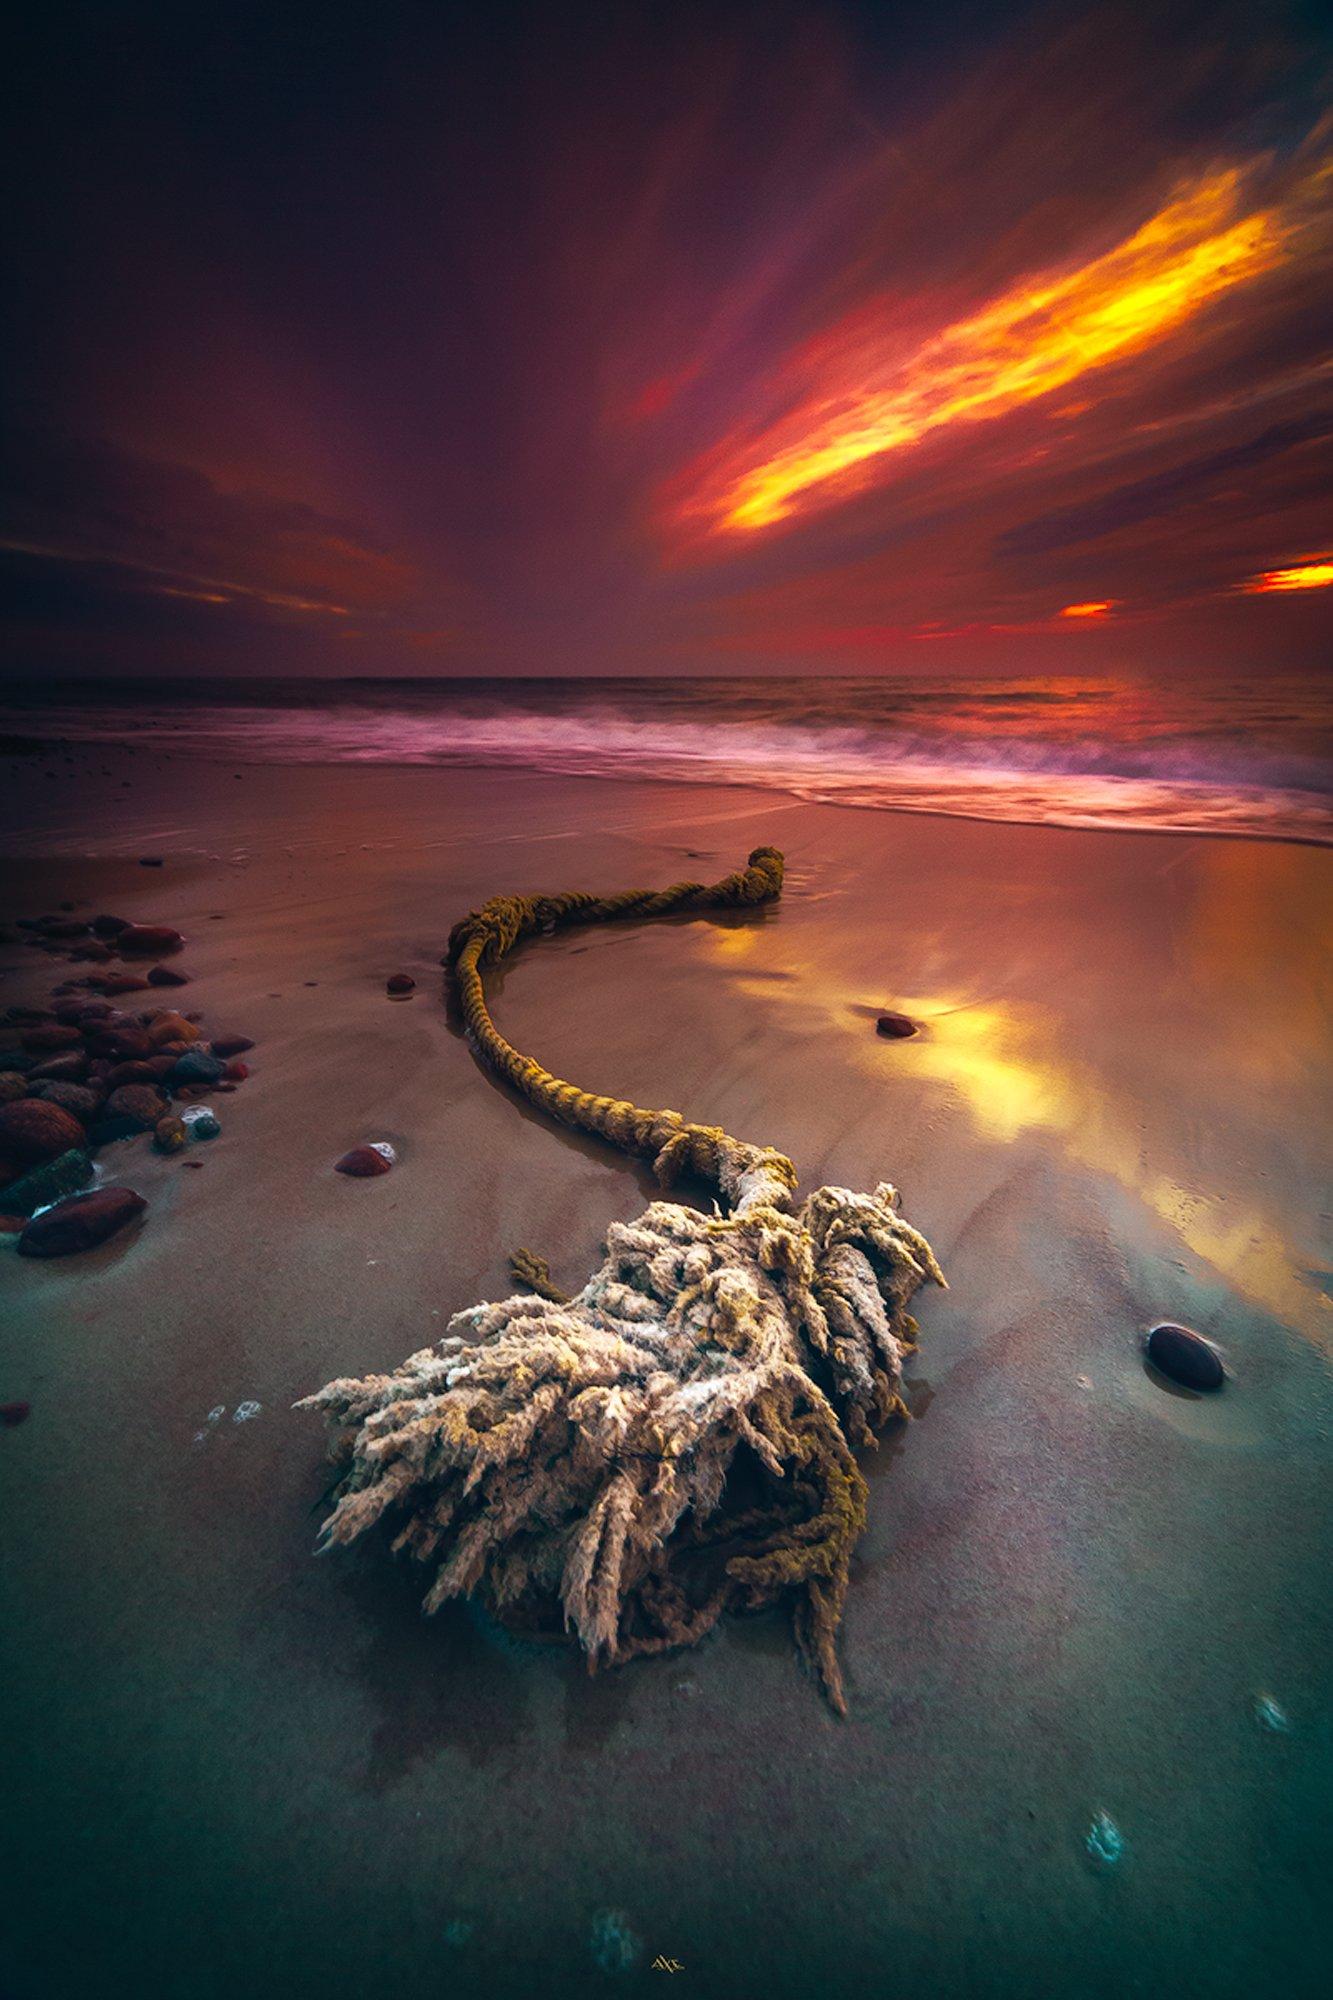 landscape, seascape, baltic sea, sunset, colors, long exposure, Руслан Болгов (Axe)